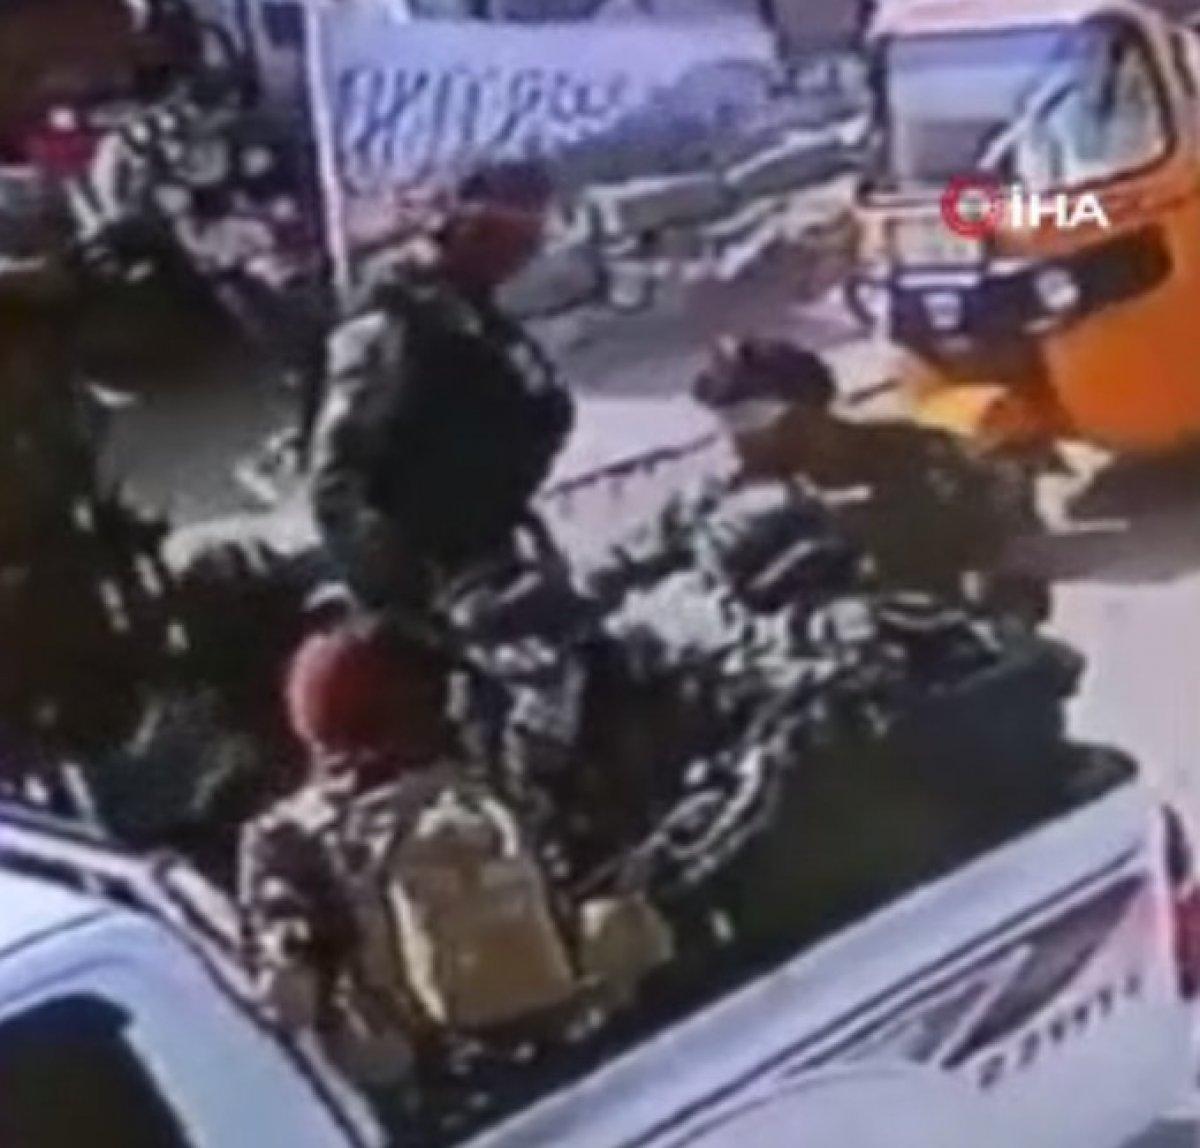 Taliban ın Afganistan bayrağı taşıyanlara müdahalesi  #3